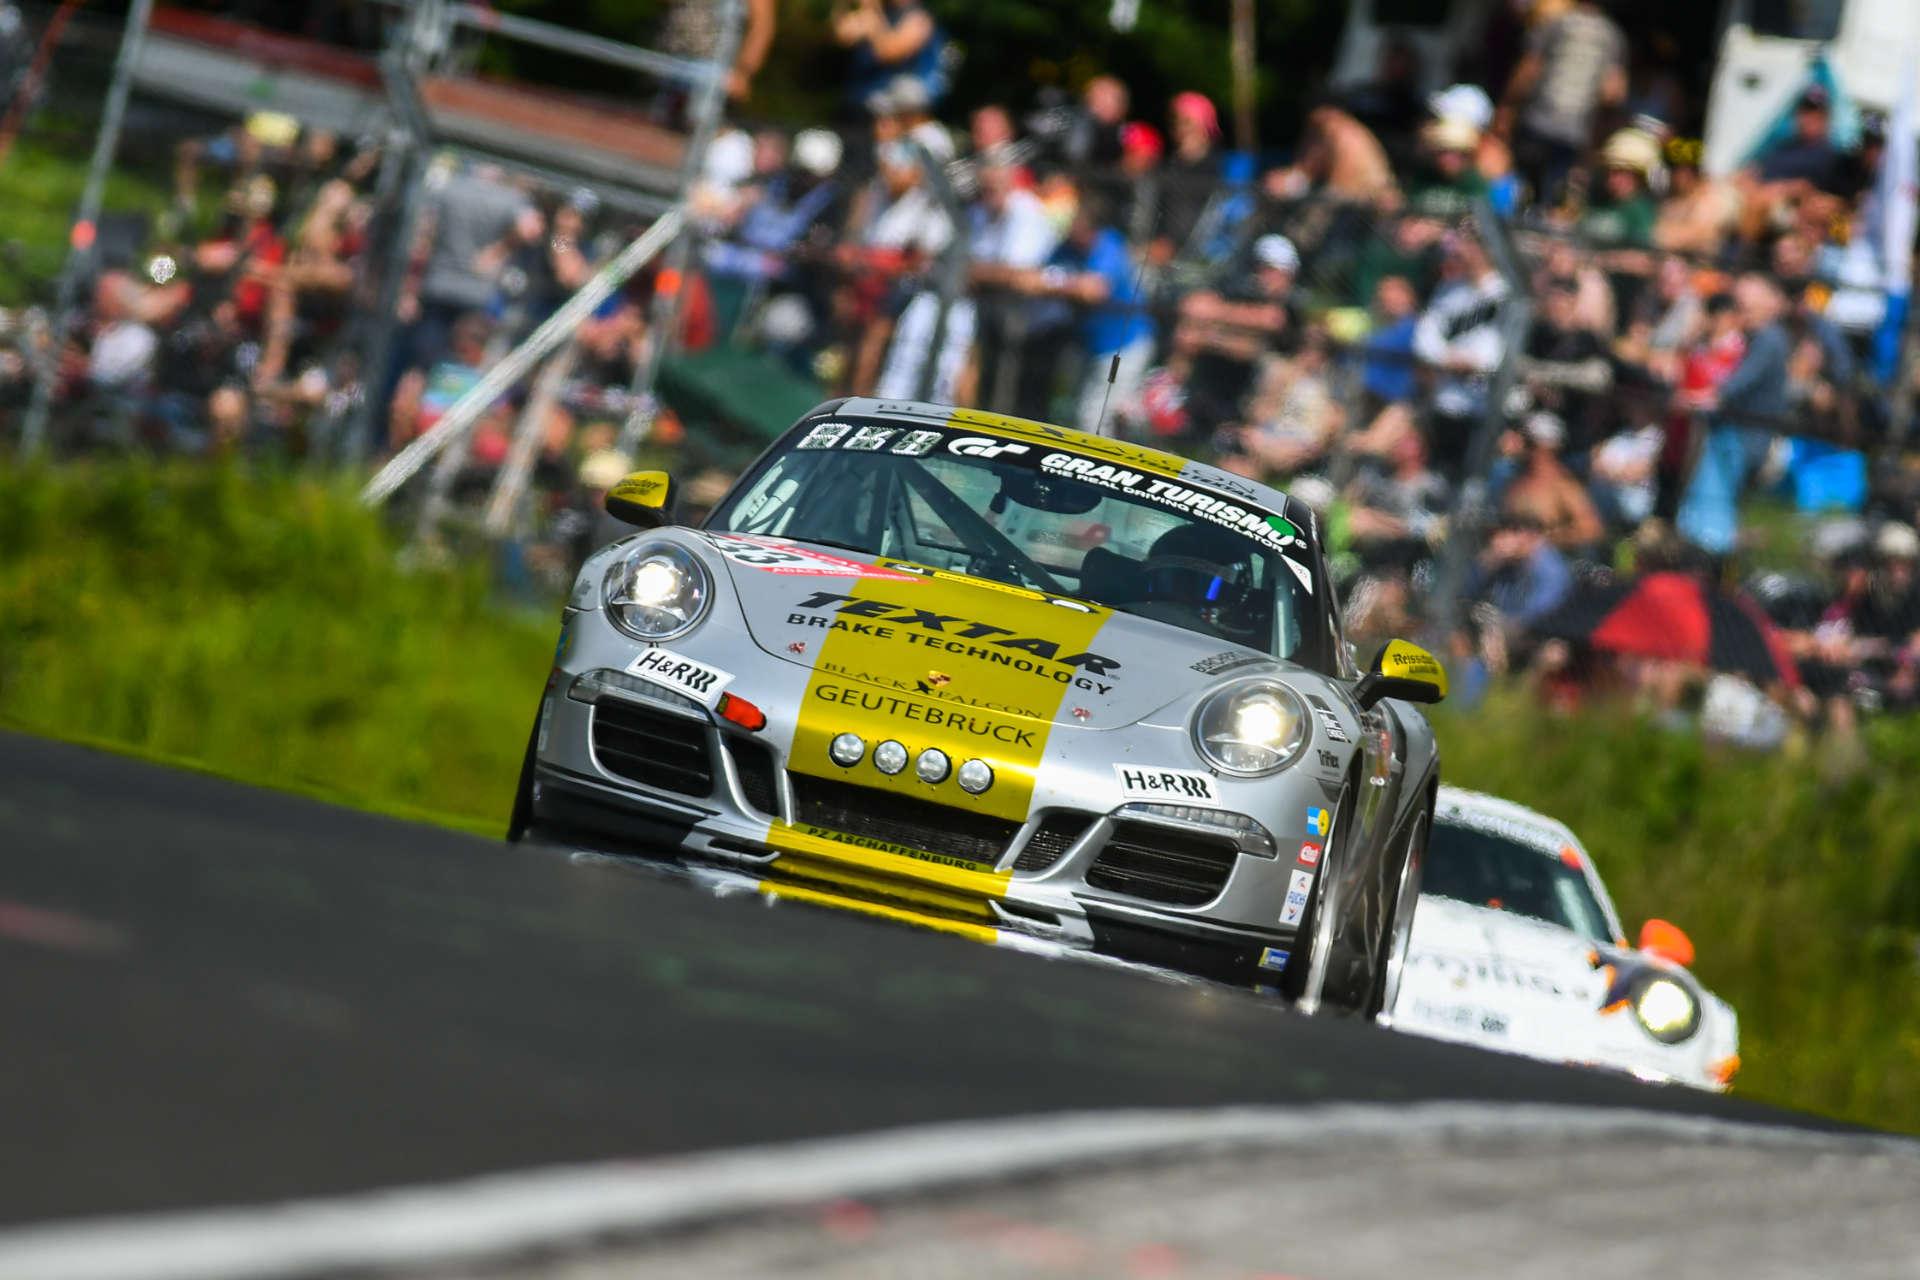 Klasse V6, Porsche 911 Carrera, Black Falcon